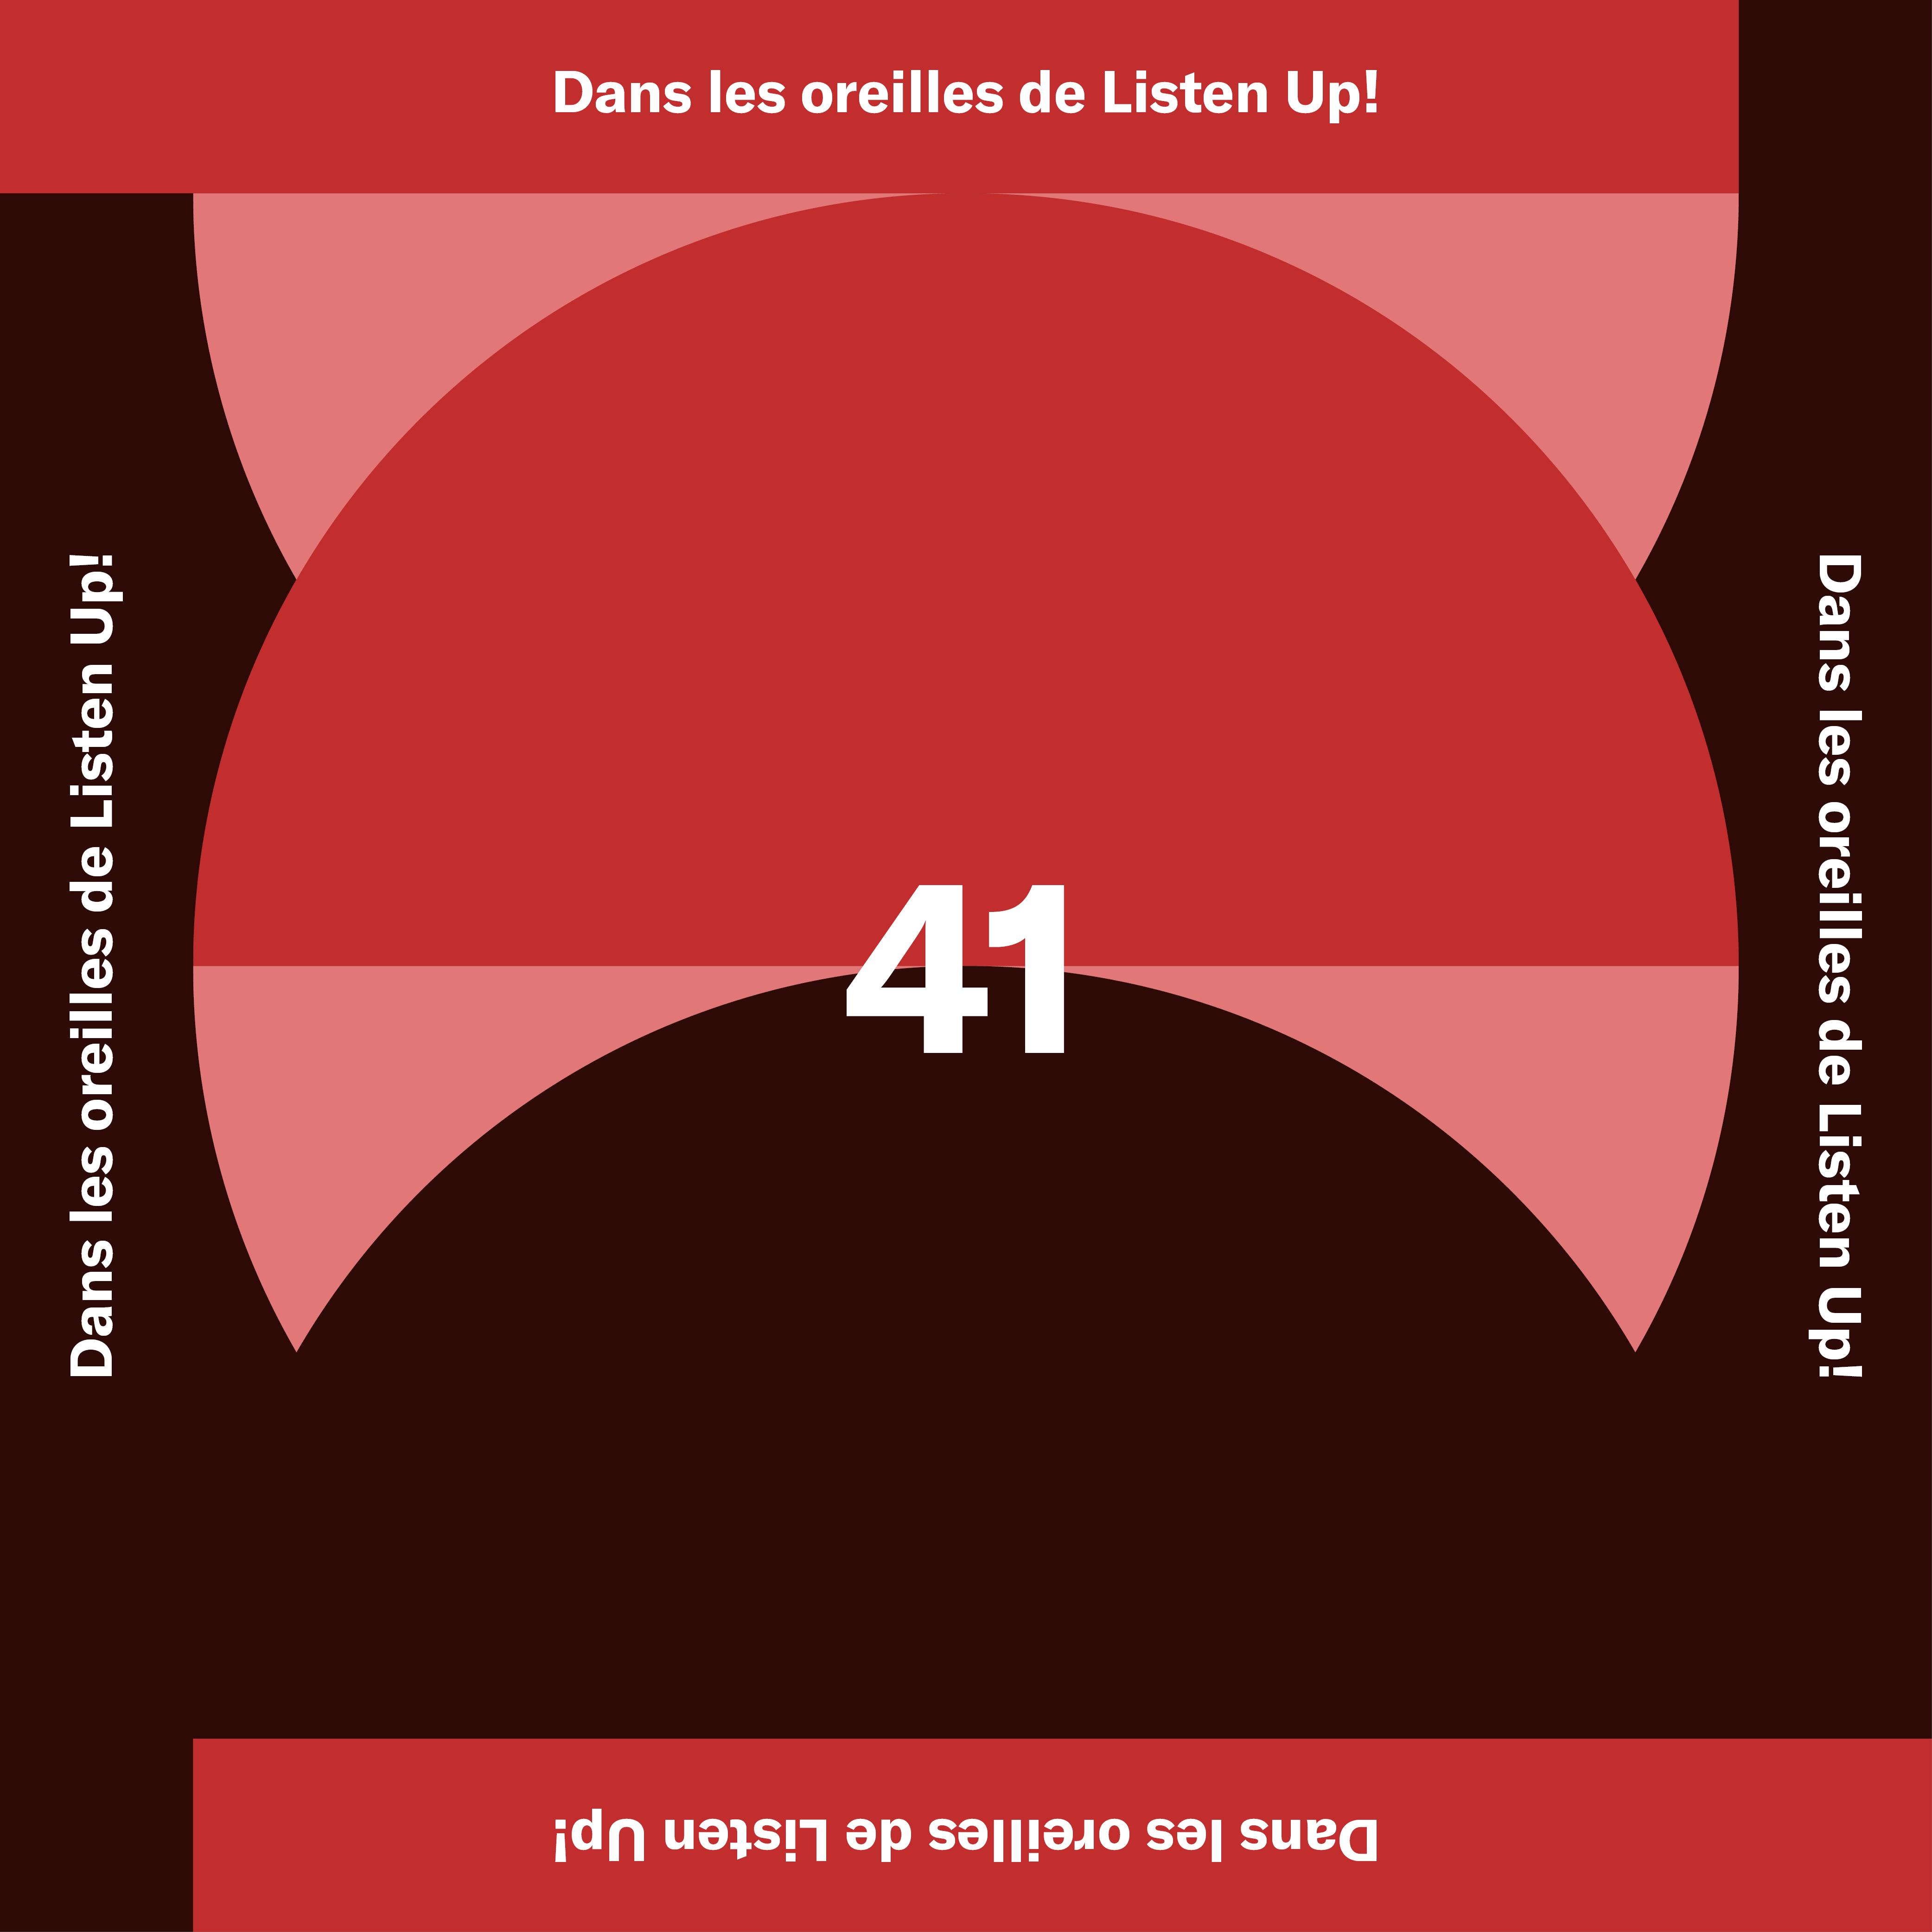 DLO_LISTENUP #41